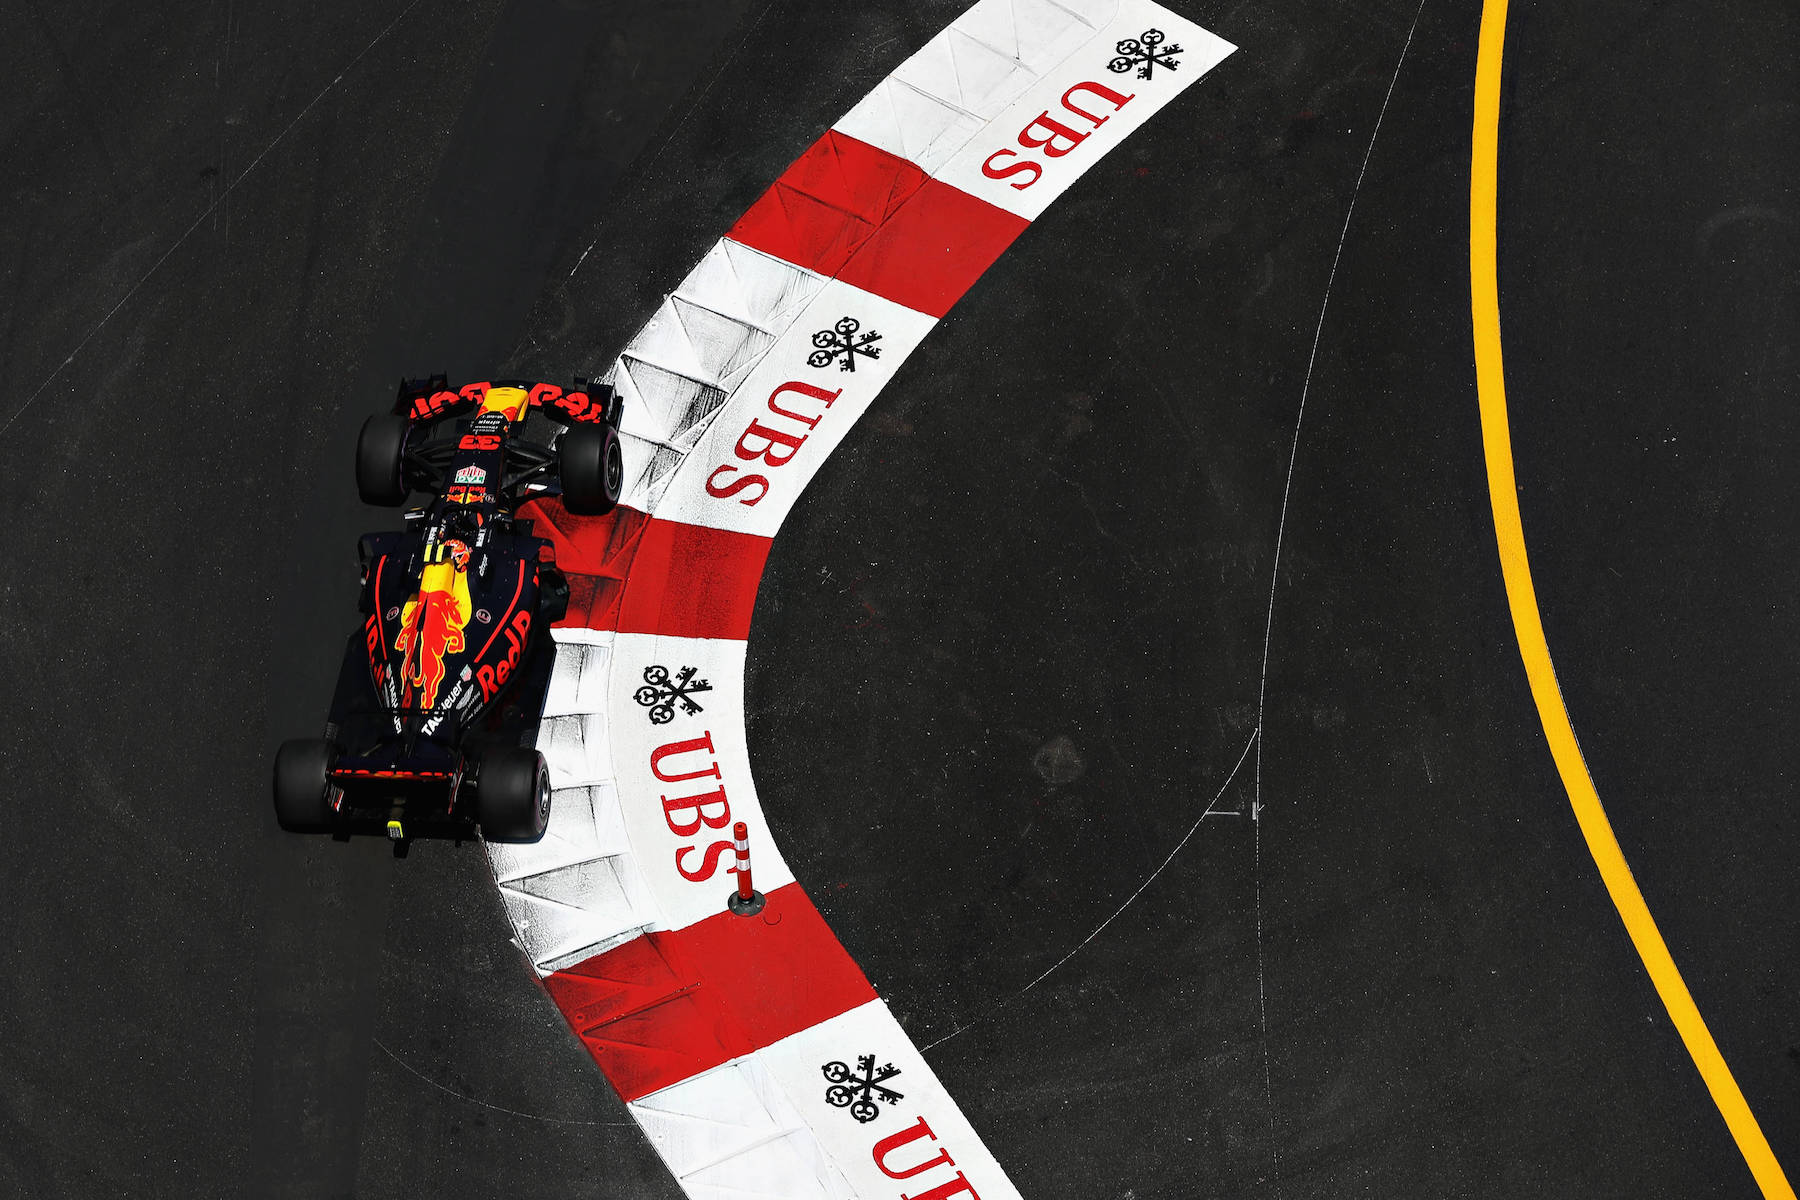 G 2017 Max Verstappen | Red Bull RB13 | 2017 Monaco GP P5 1 copy.jpg